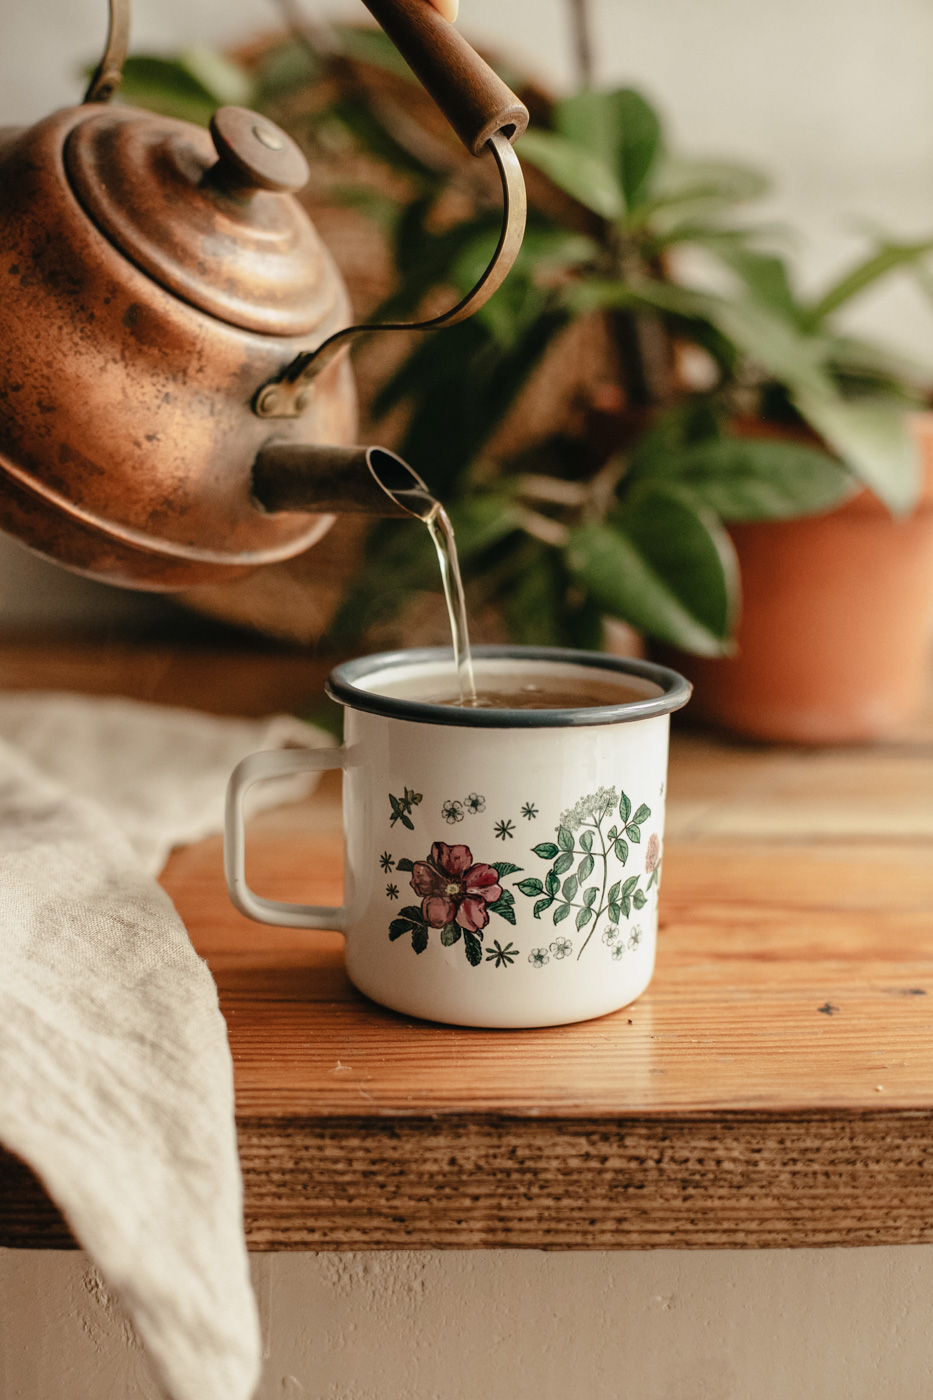 Special Anniversary Floral Enamel Mug - Herbal Academy Mug for Herbalists